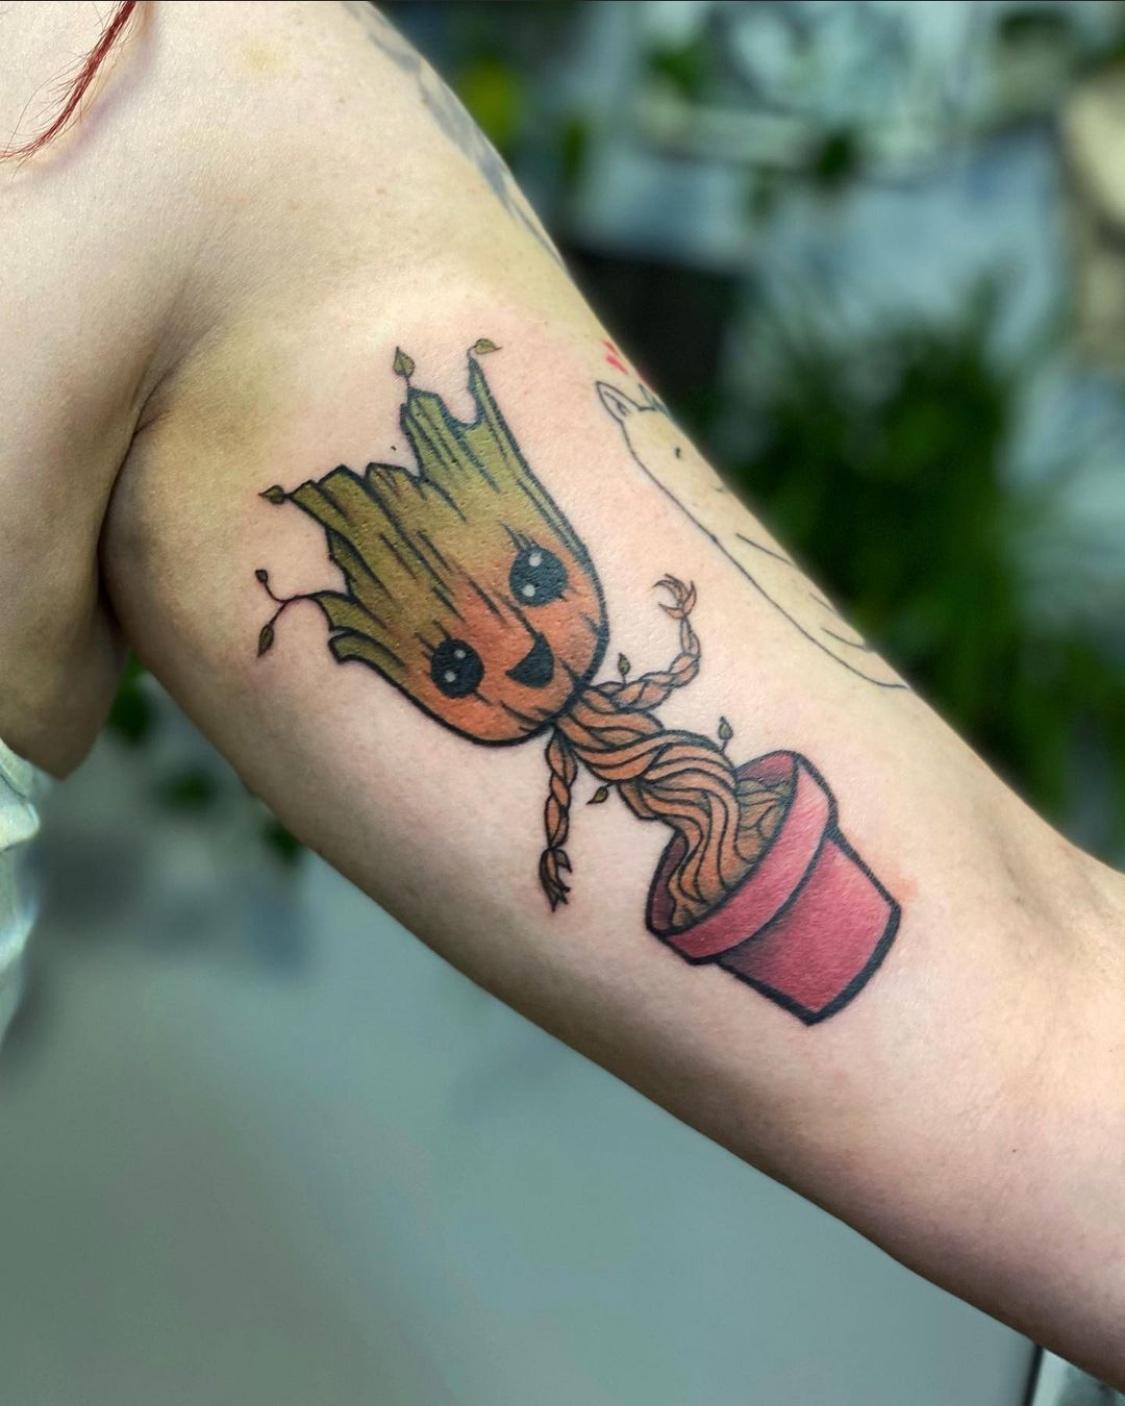 Inksearch tattoo Lunar Ink